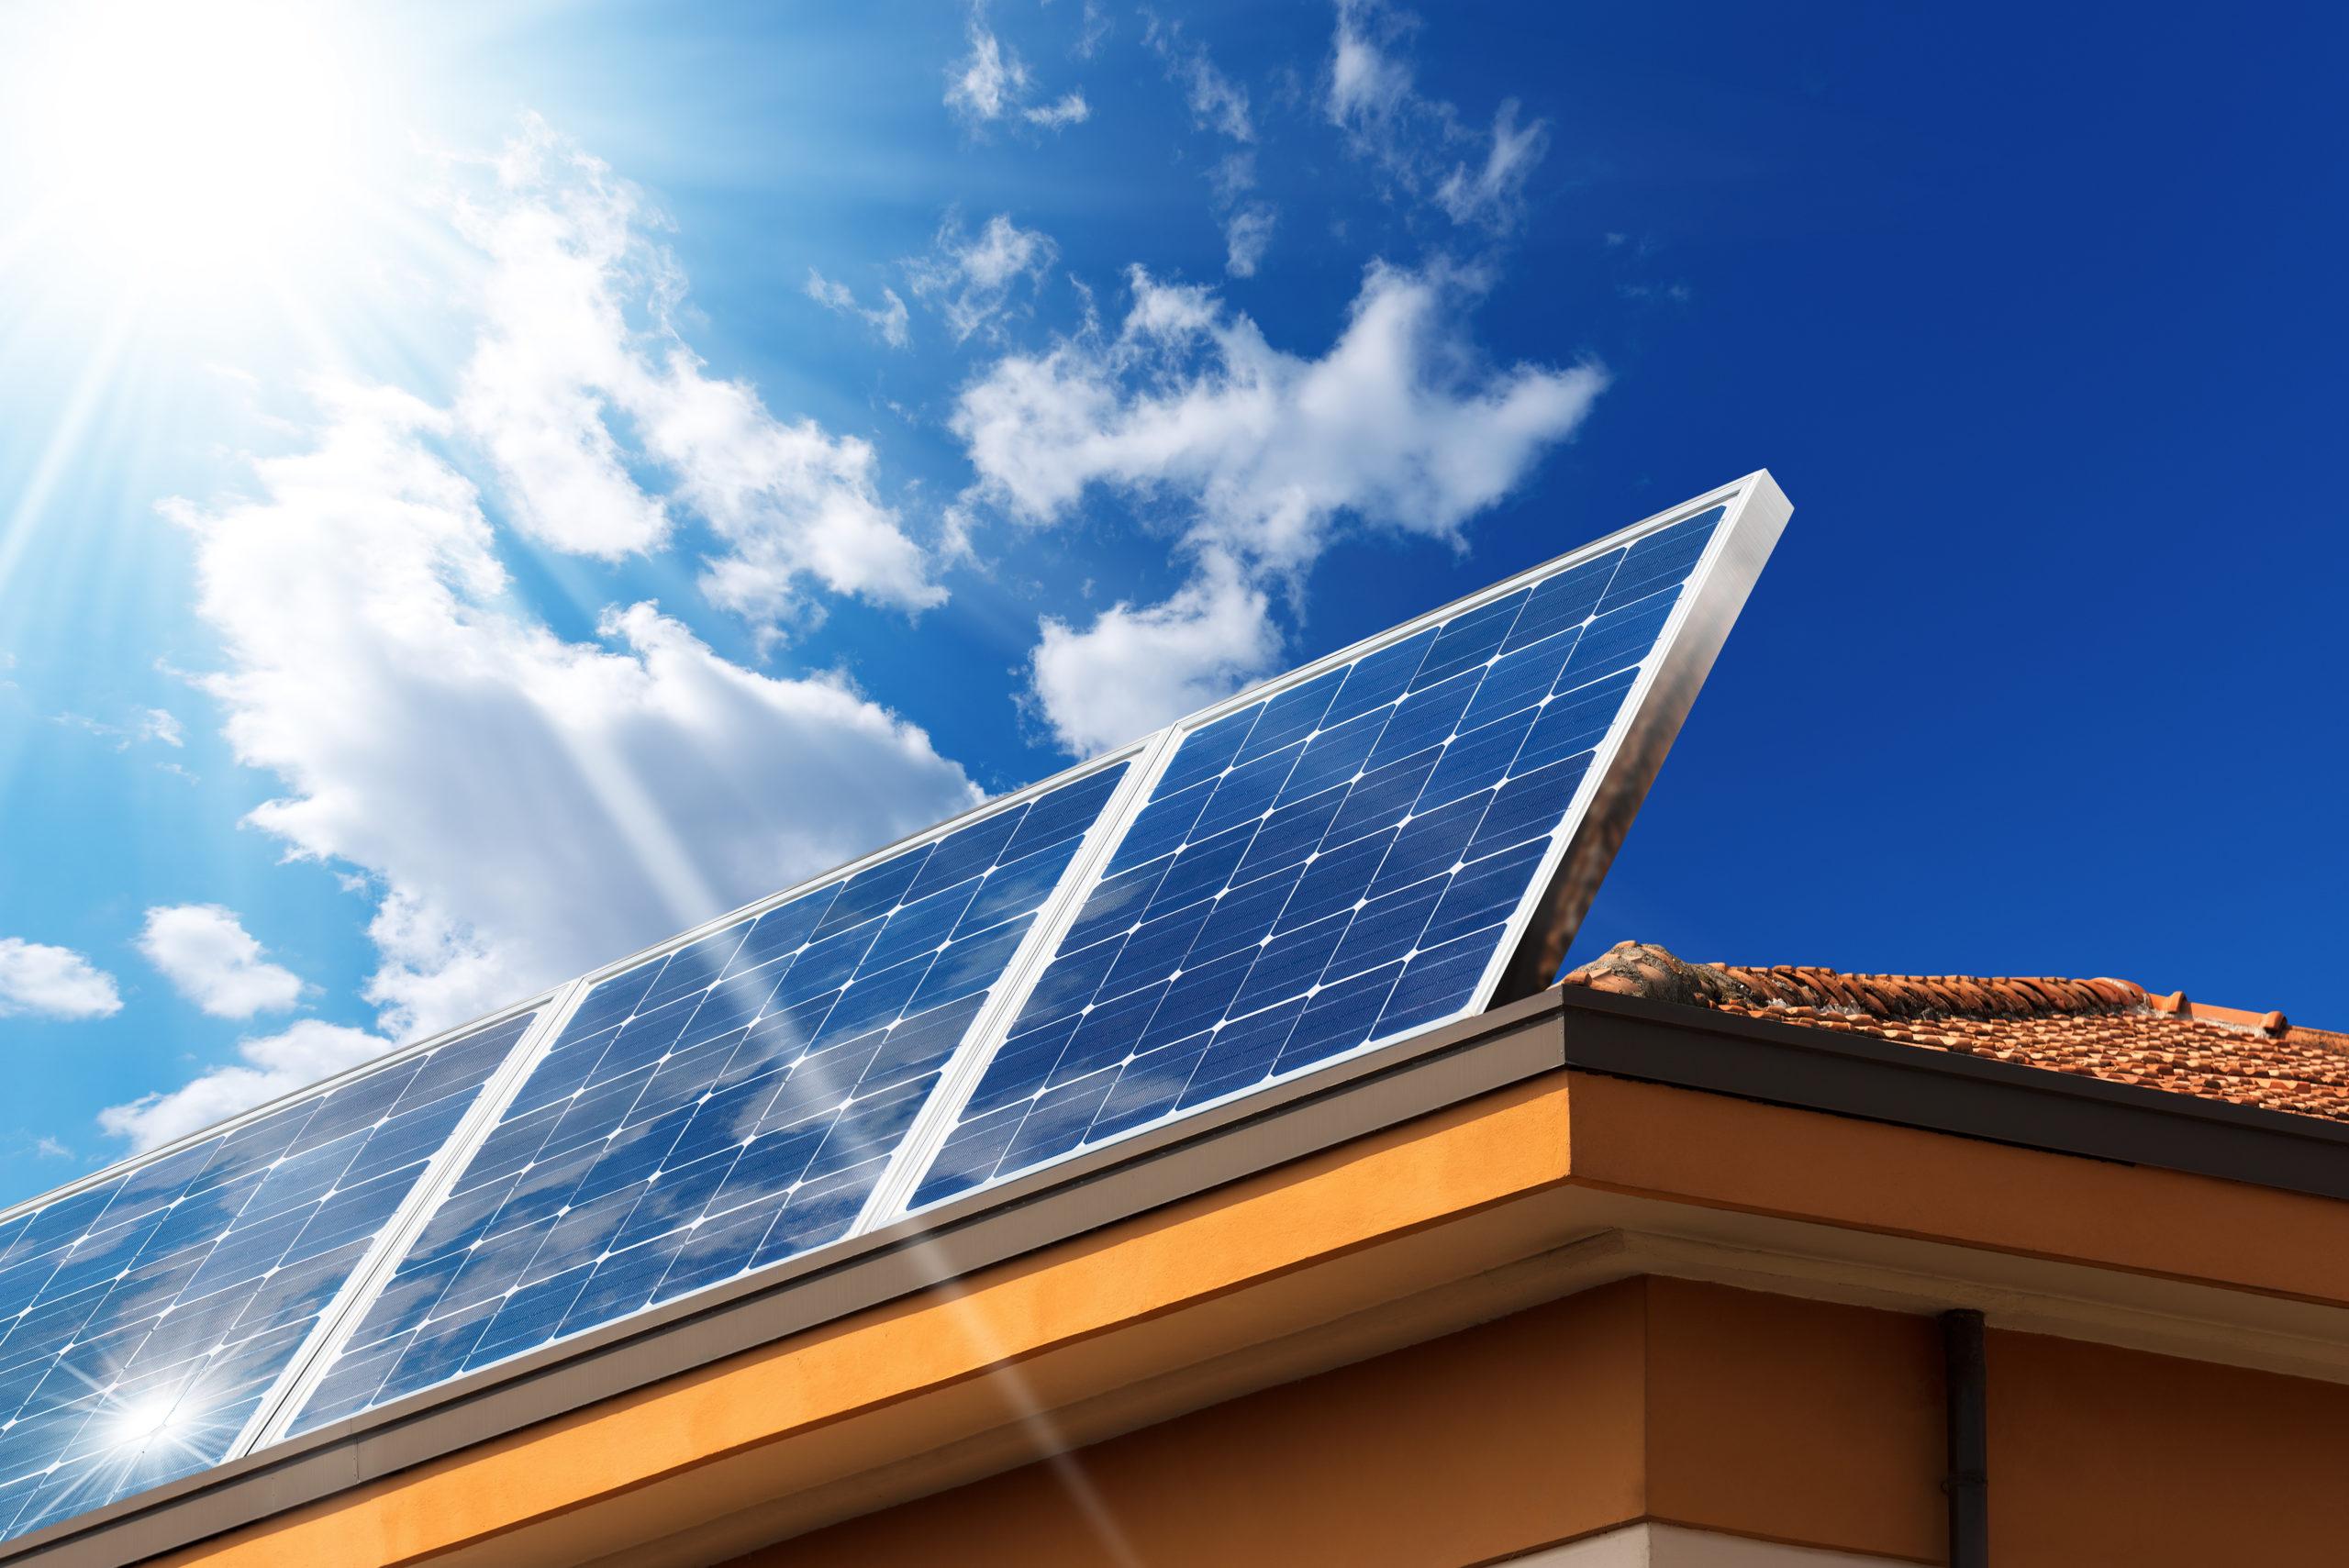 Solar panels property value